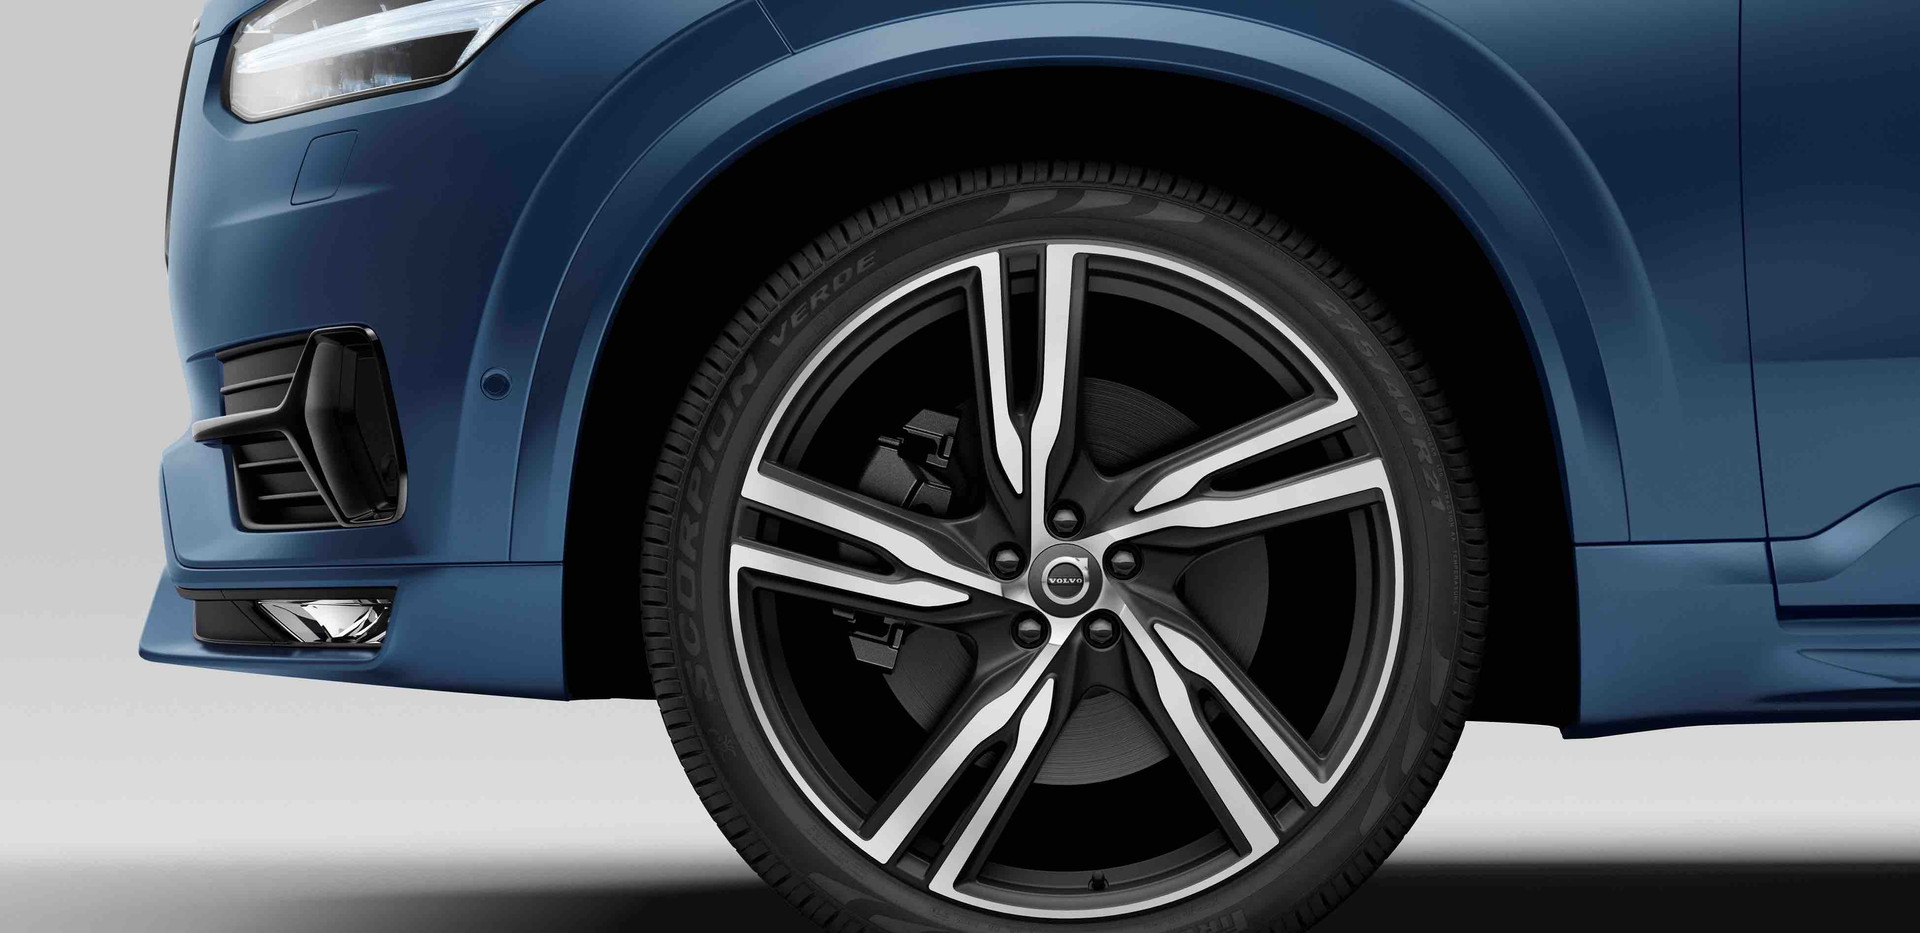 152194_The_all-new_Volvo_XC90_R-Design.j